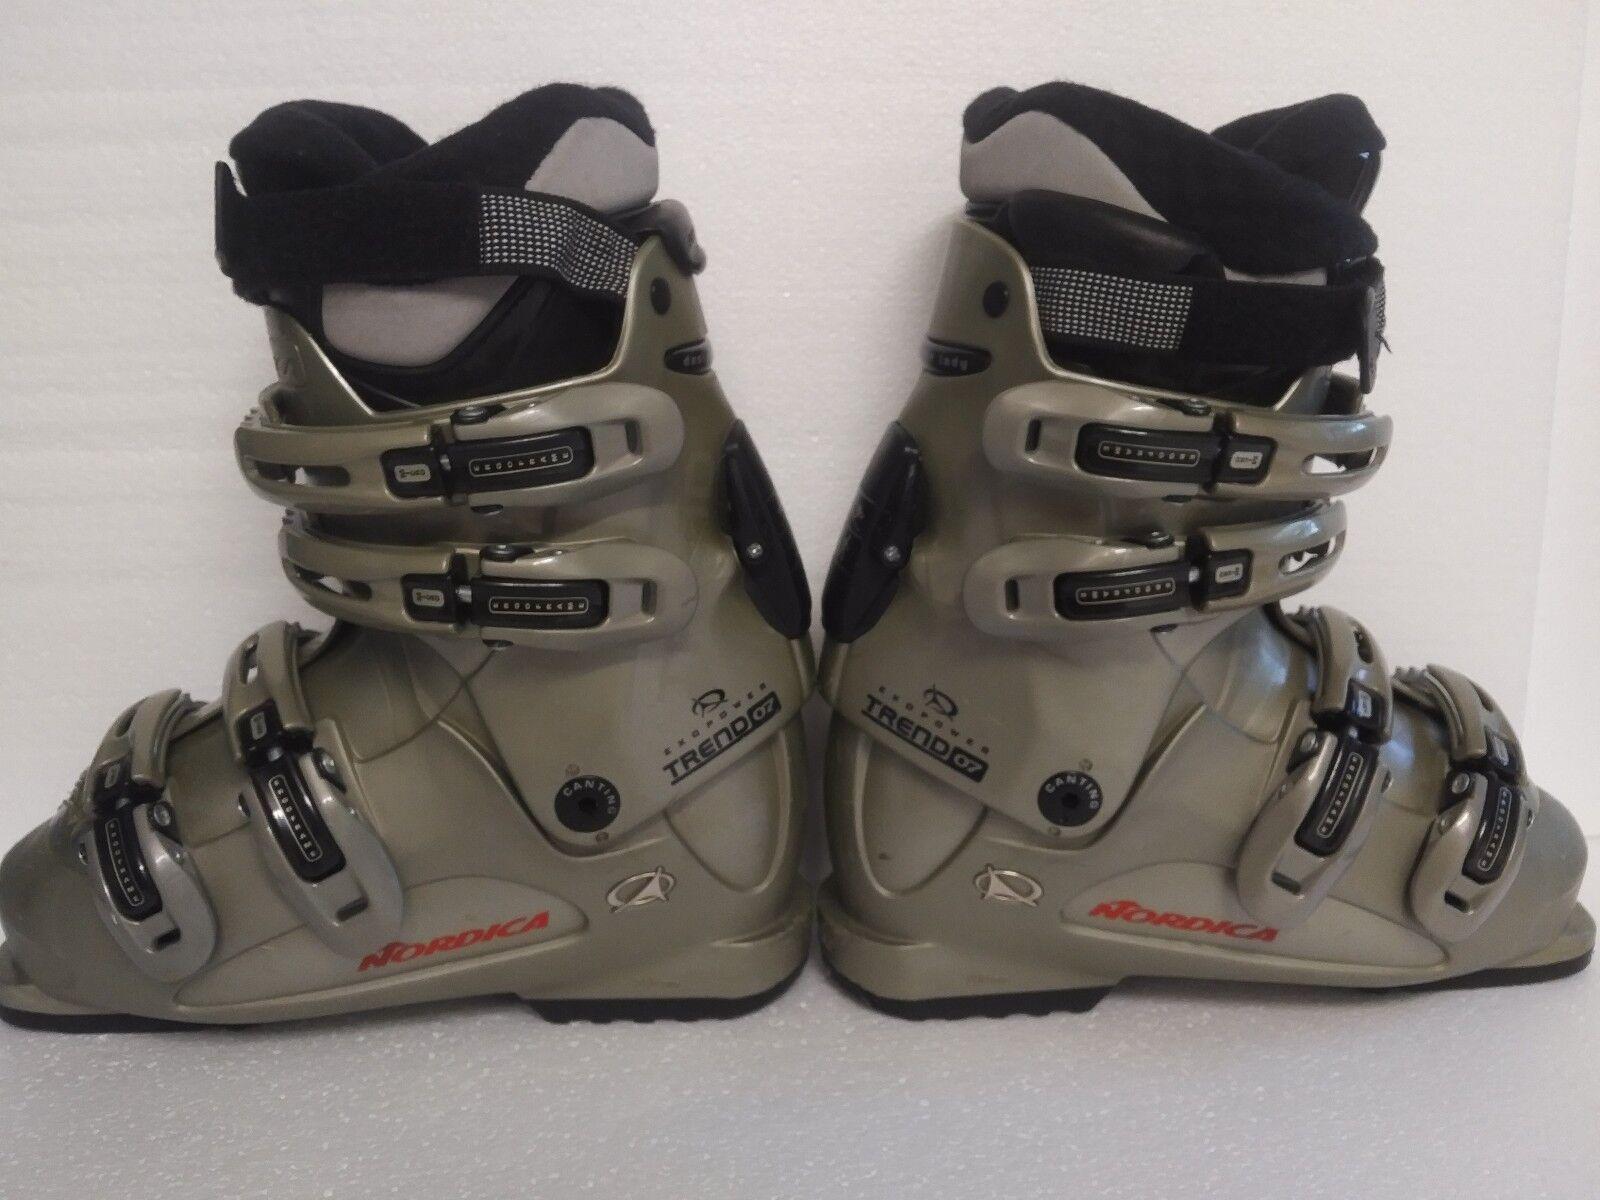 NORDICA Exopower Trend 07 Women's Ski Boots